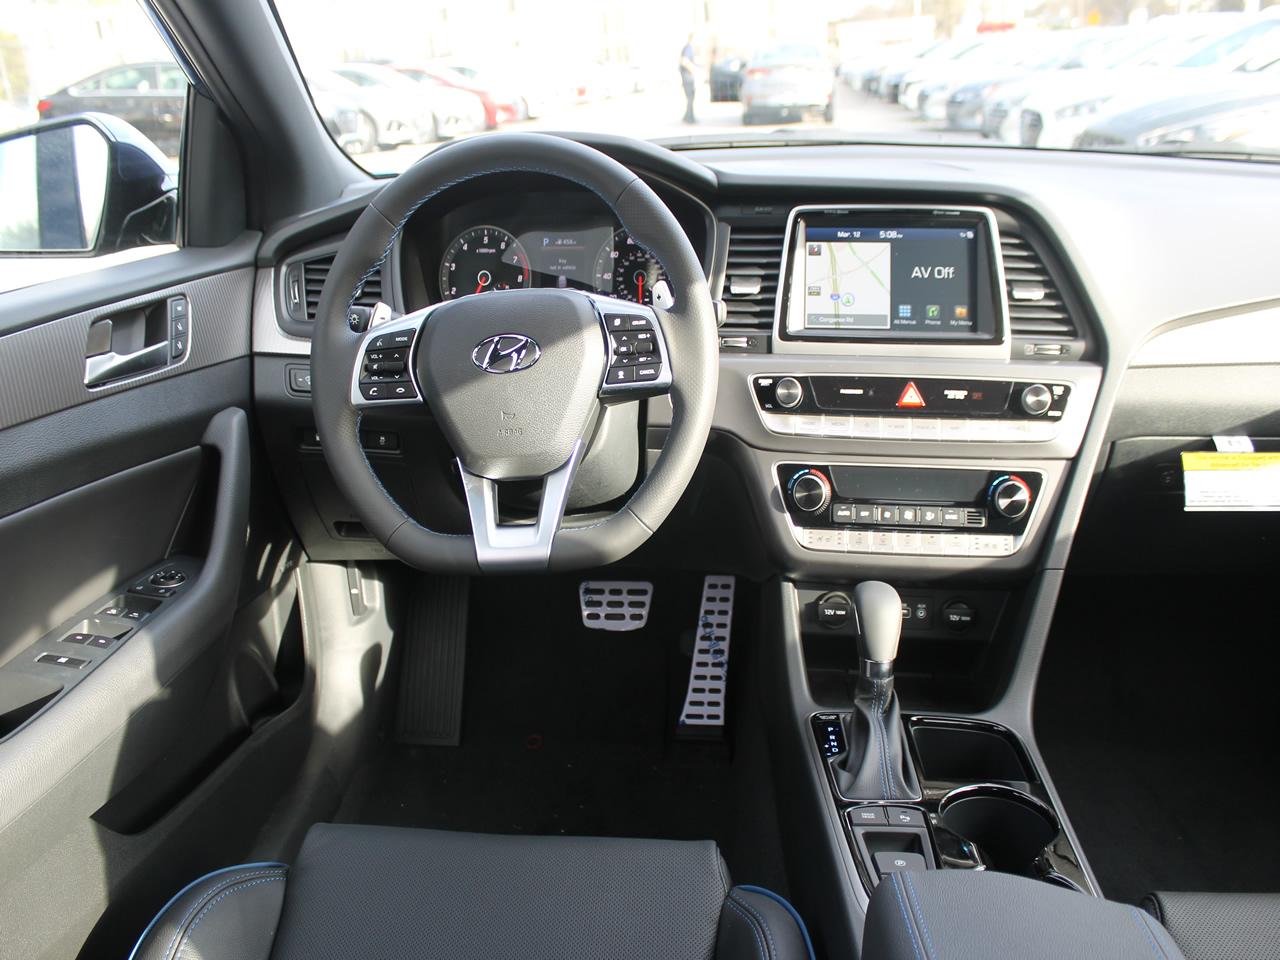 New 2019 Hyundai Sonata Limited 2 0t Vin 5npe34ab6kh773212